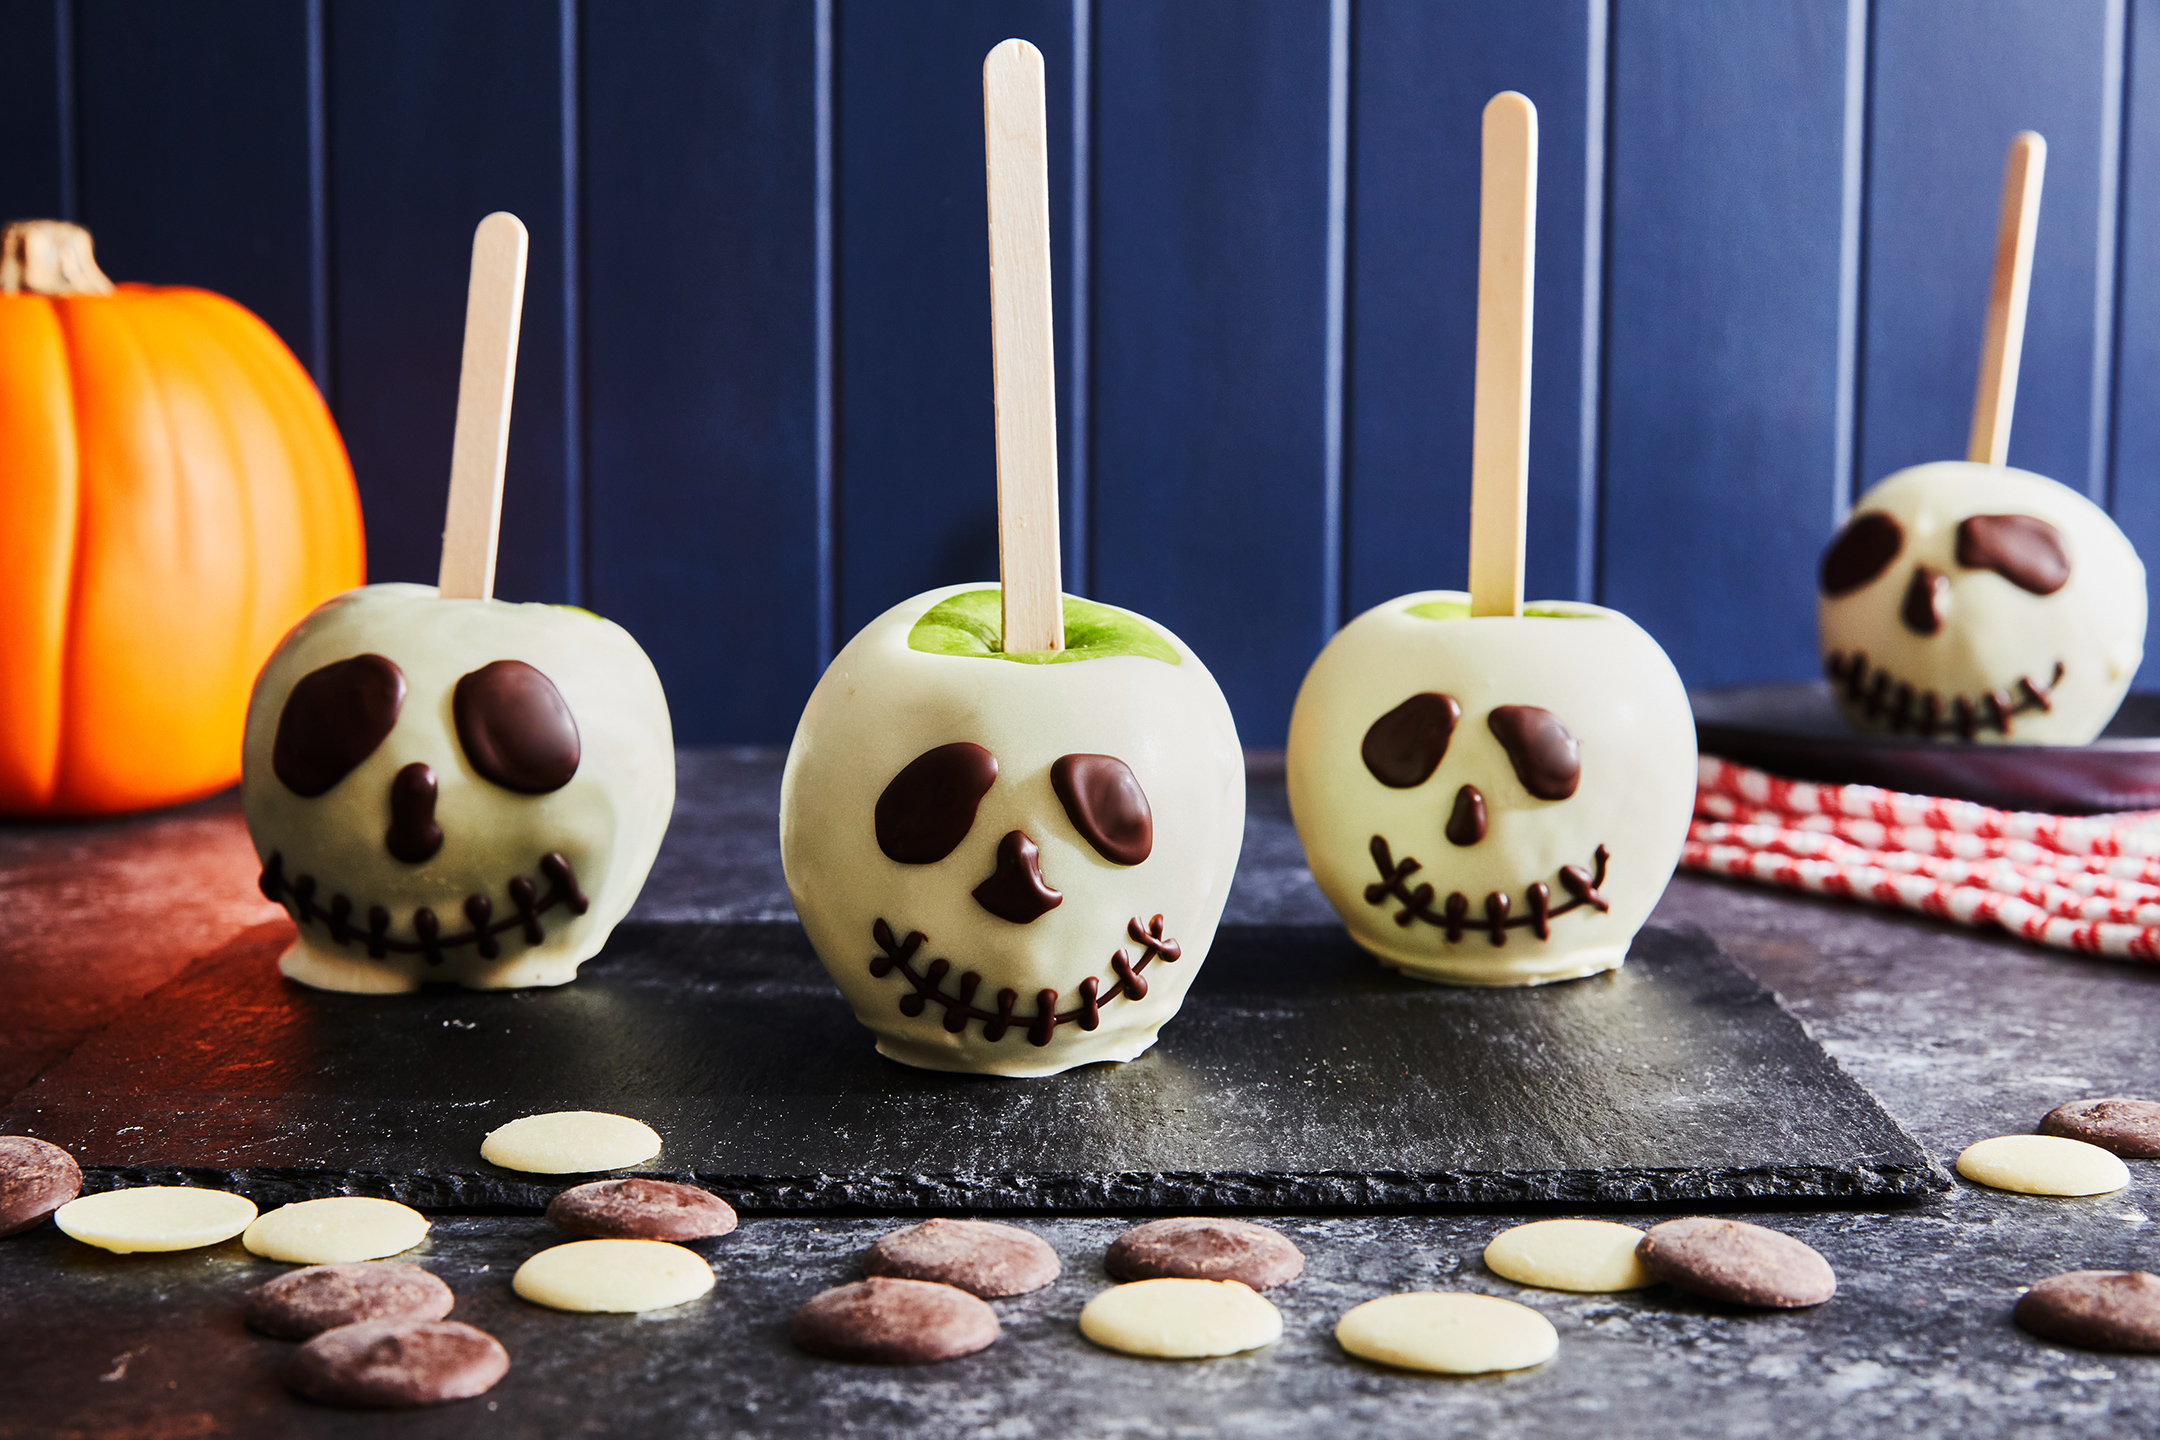 Candy Apple Skeletons